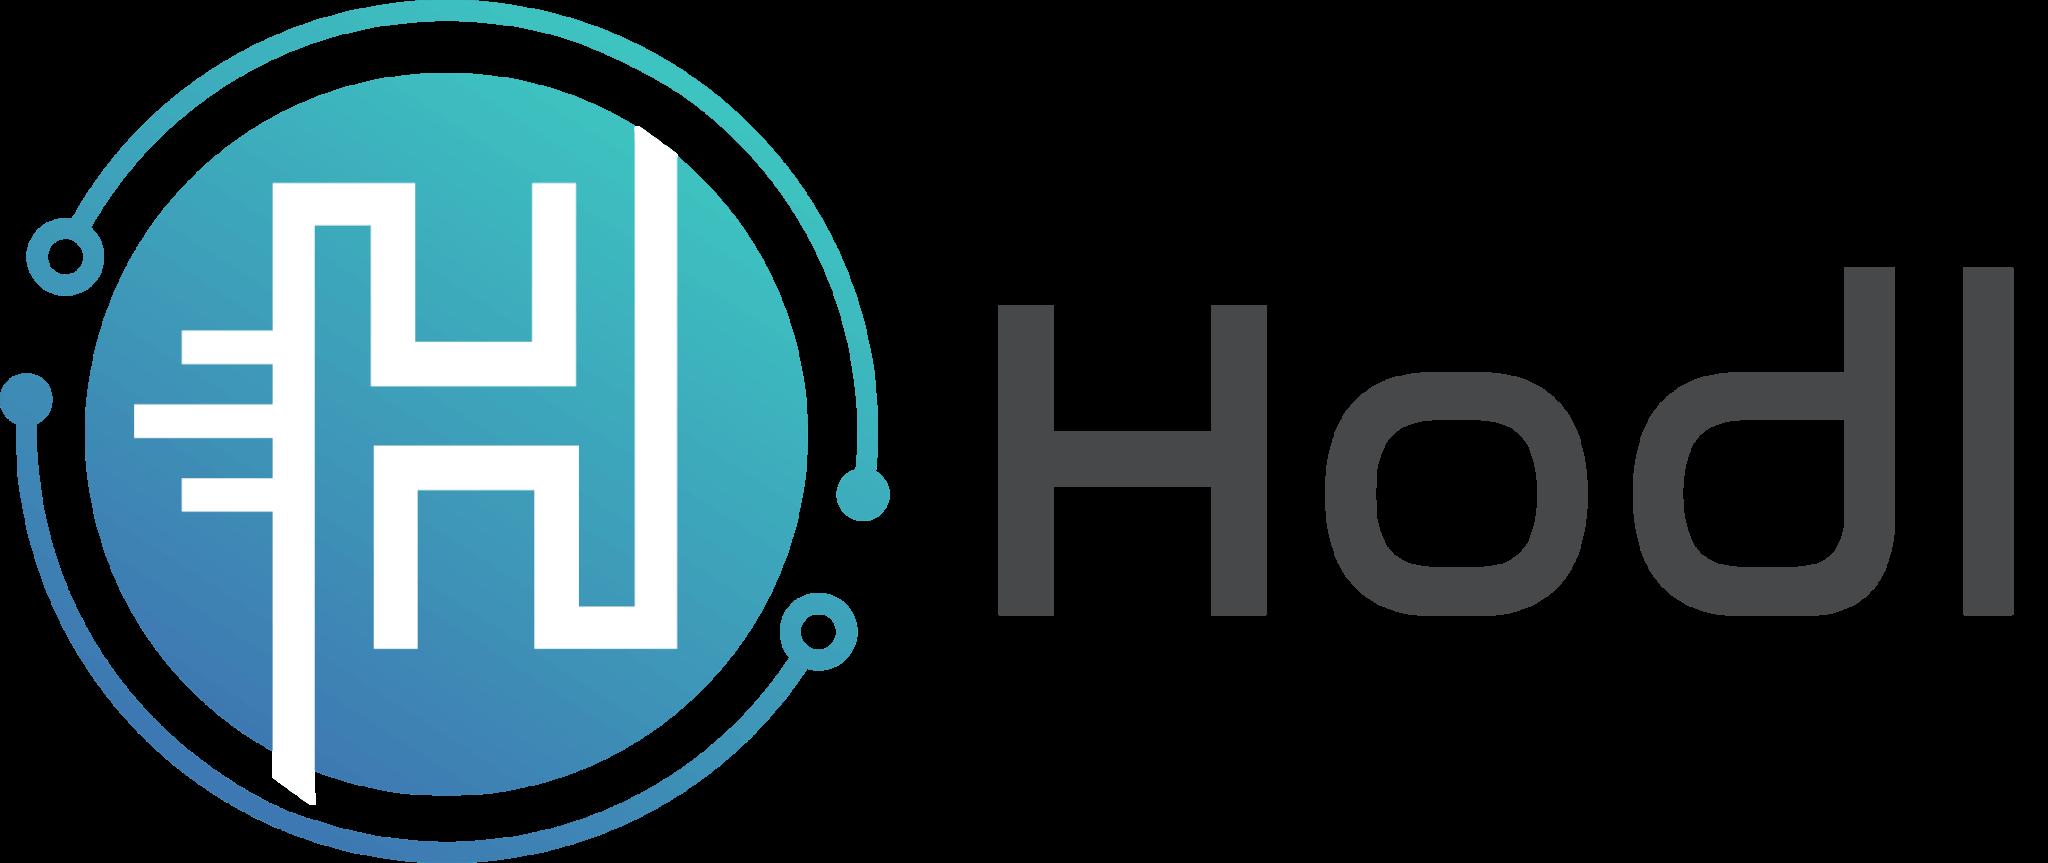 Hodl crypto kopen logo